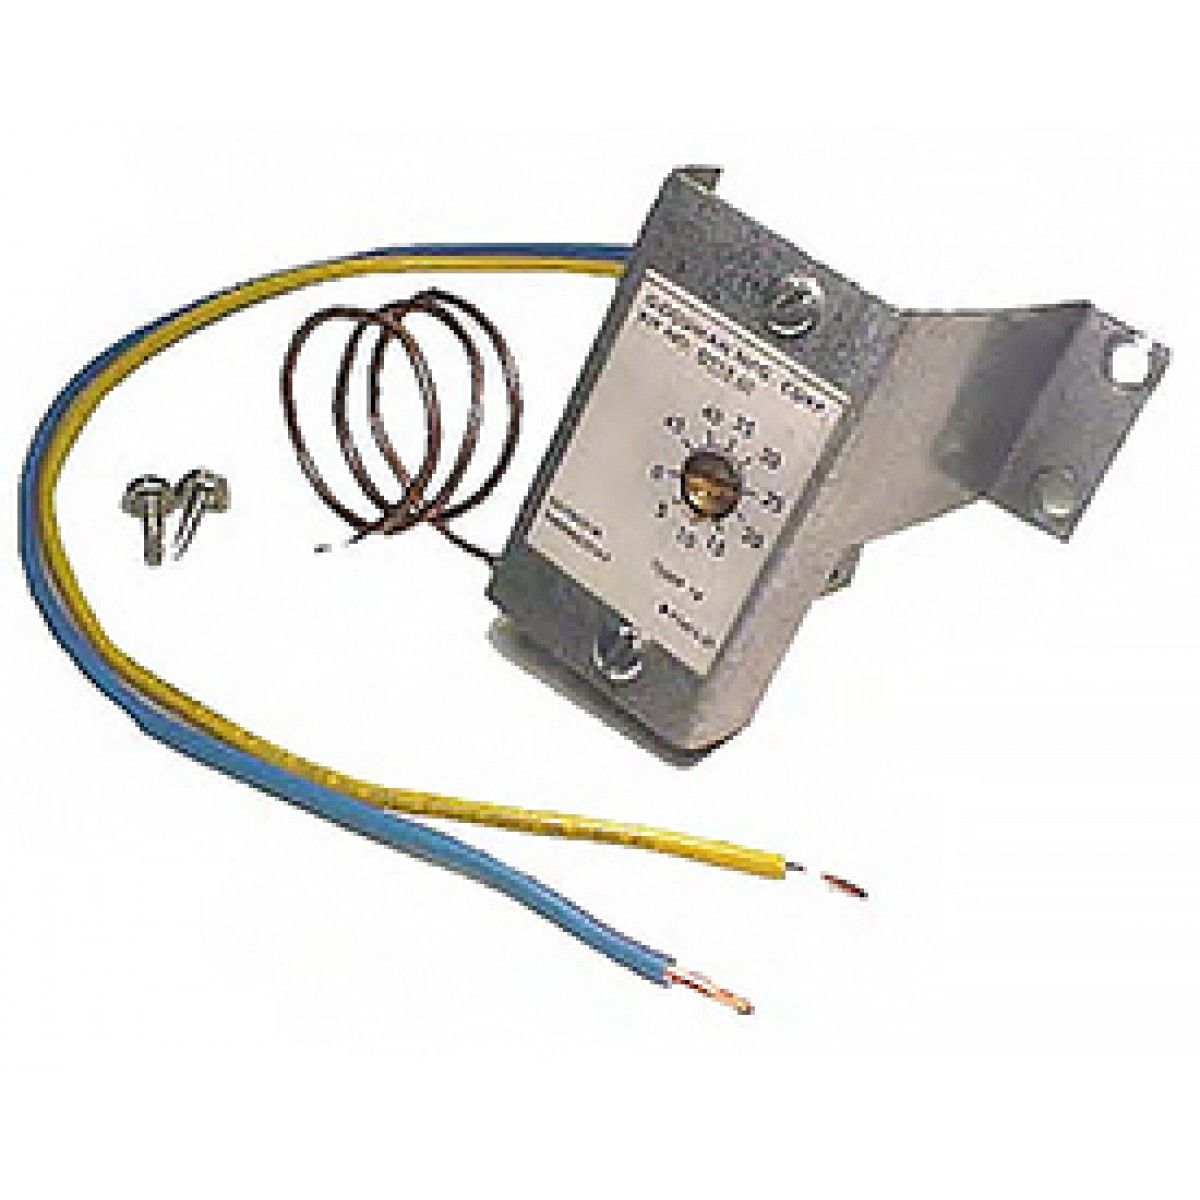 goodman outdoor heat pump stat thermostats accessories. Black Bedroom Furniture Sets. Home Design Ideas